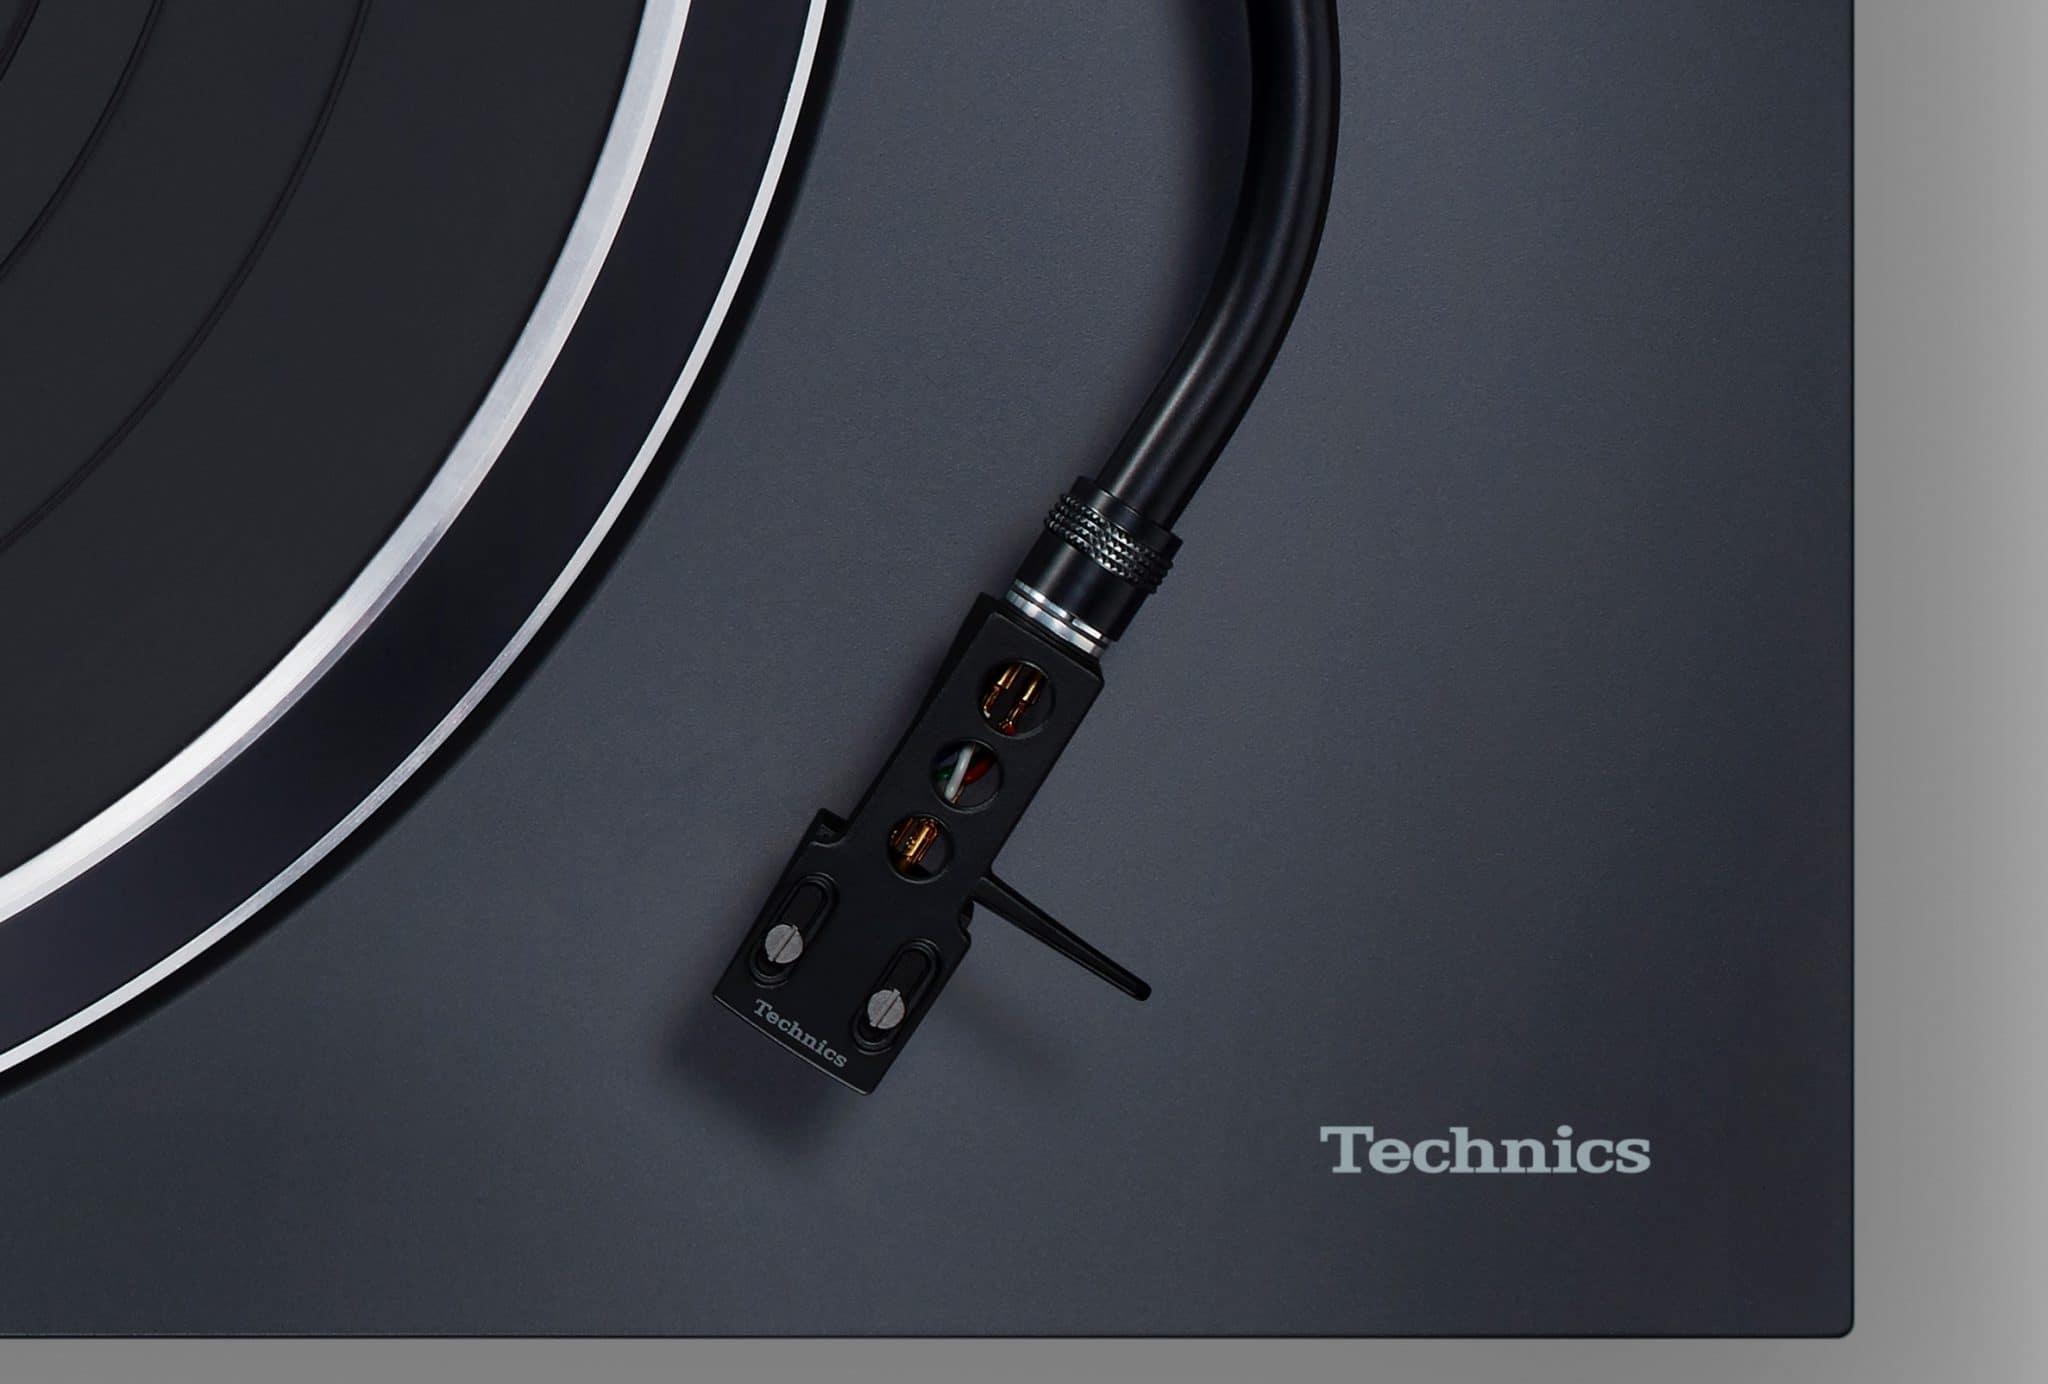 SL-1500C Turntable from Technics